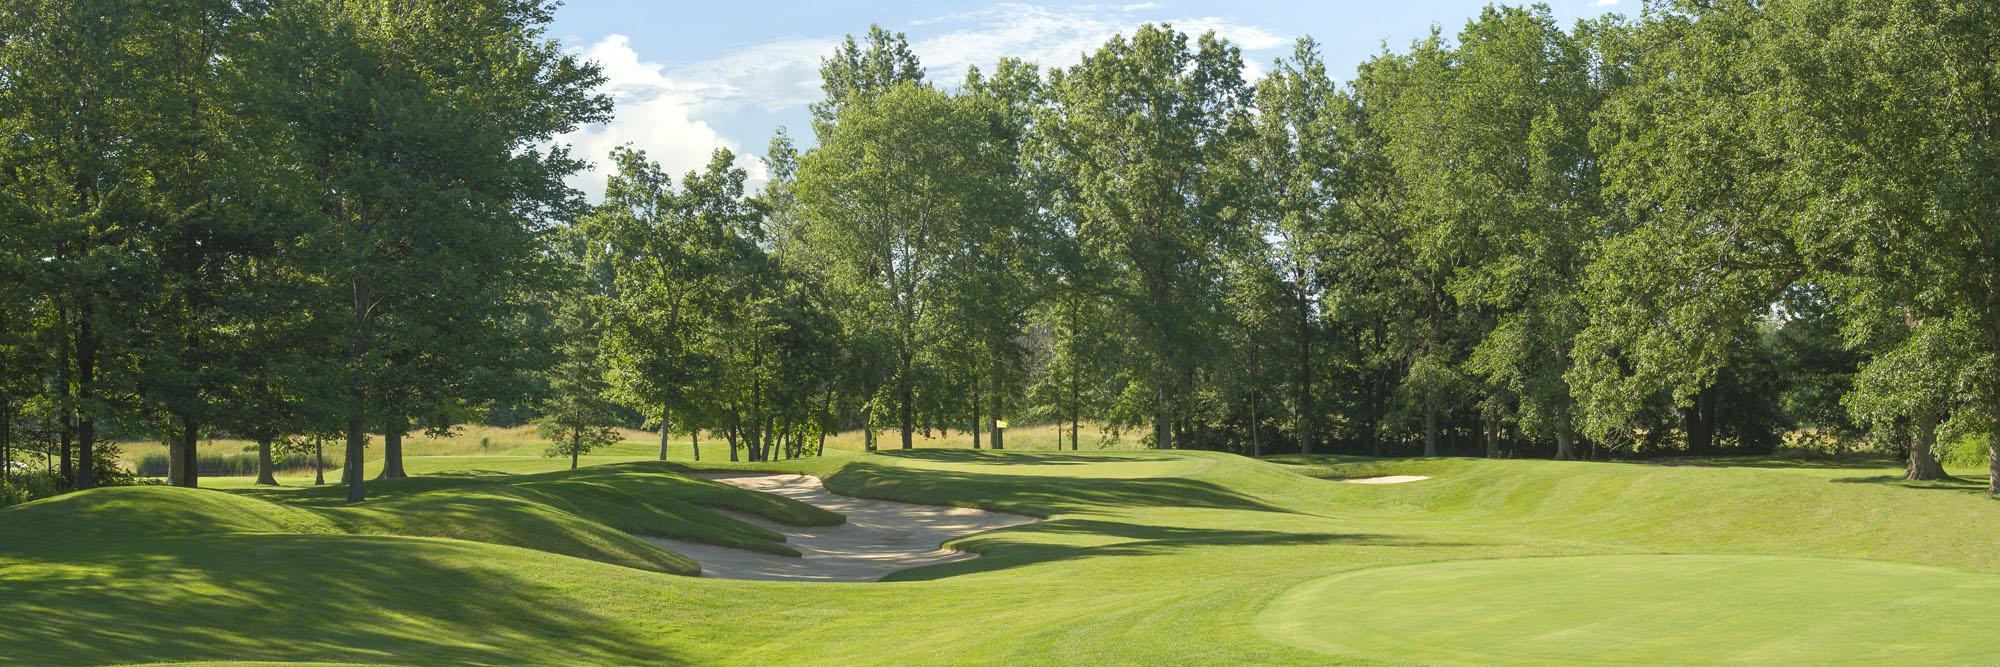 Golf Course Image - Jefferson Country Club No. 8